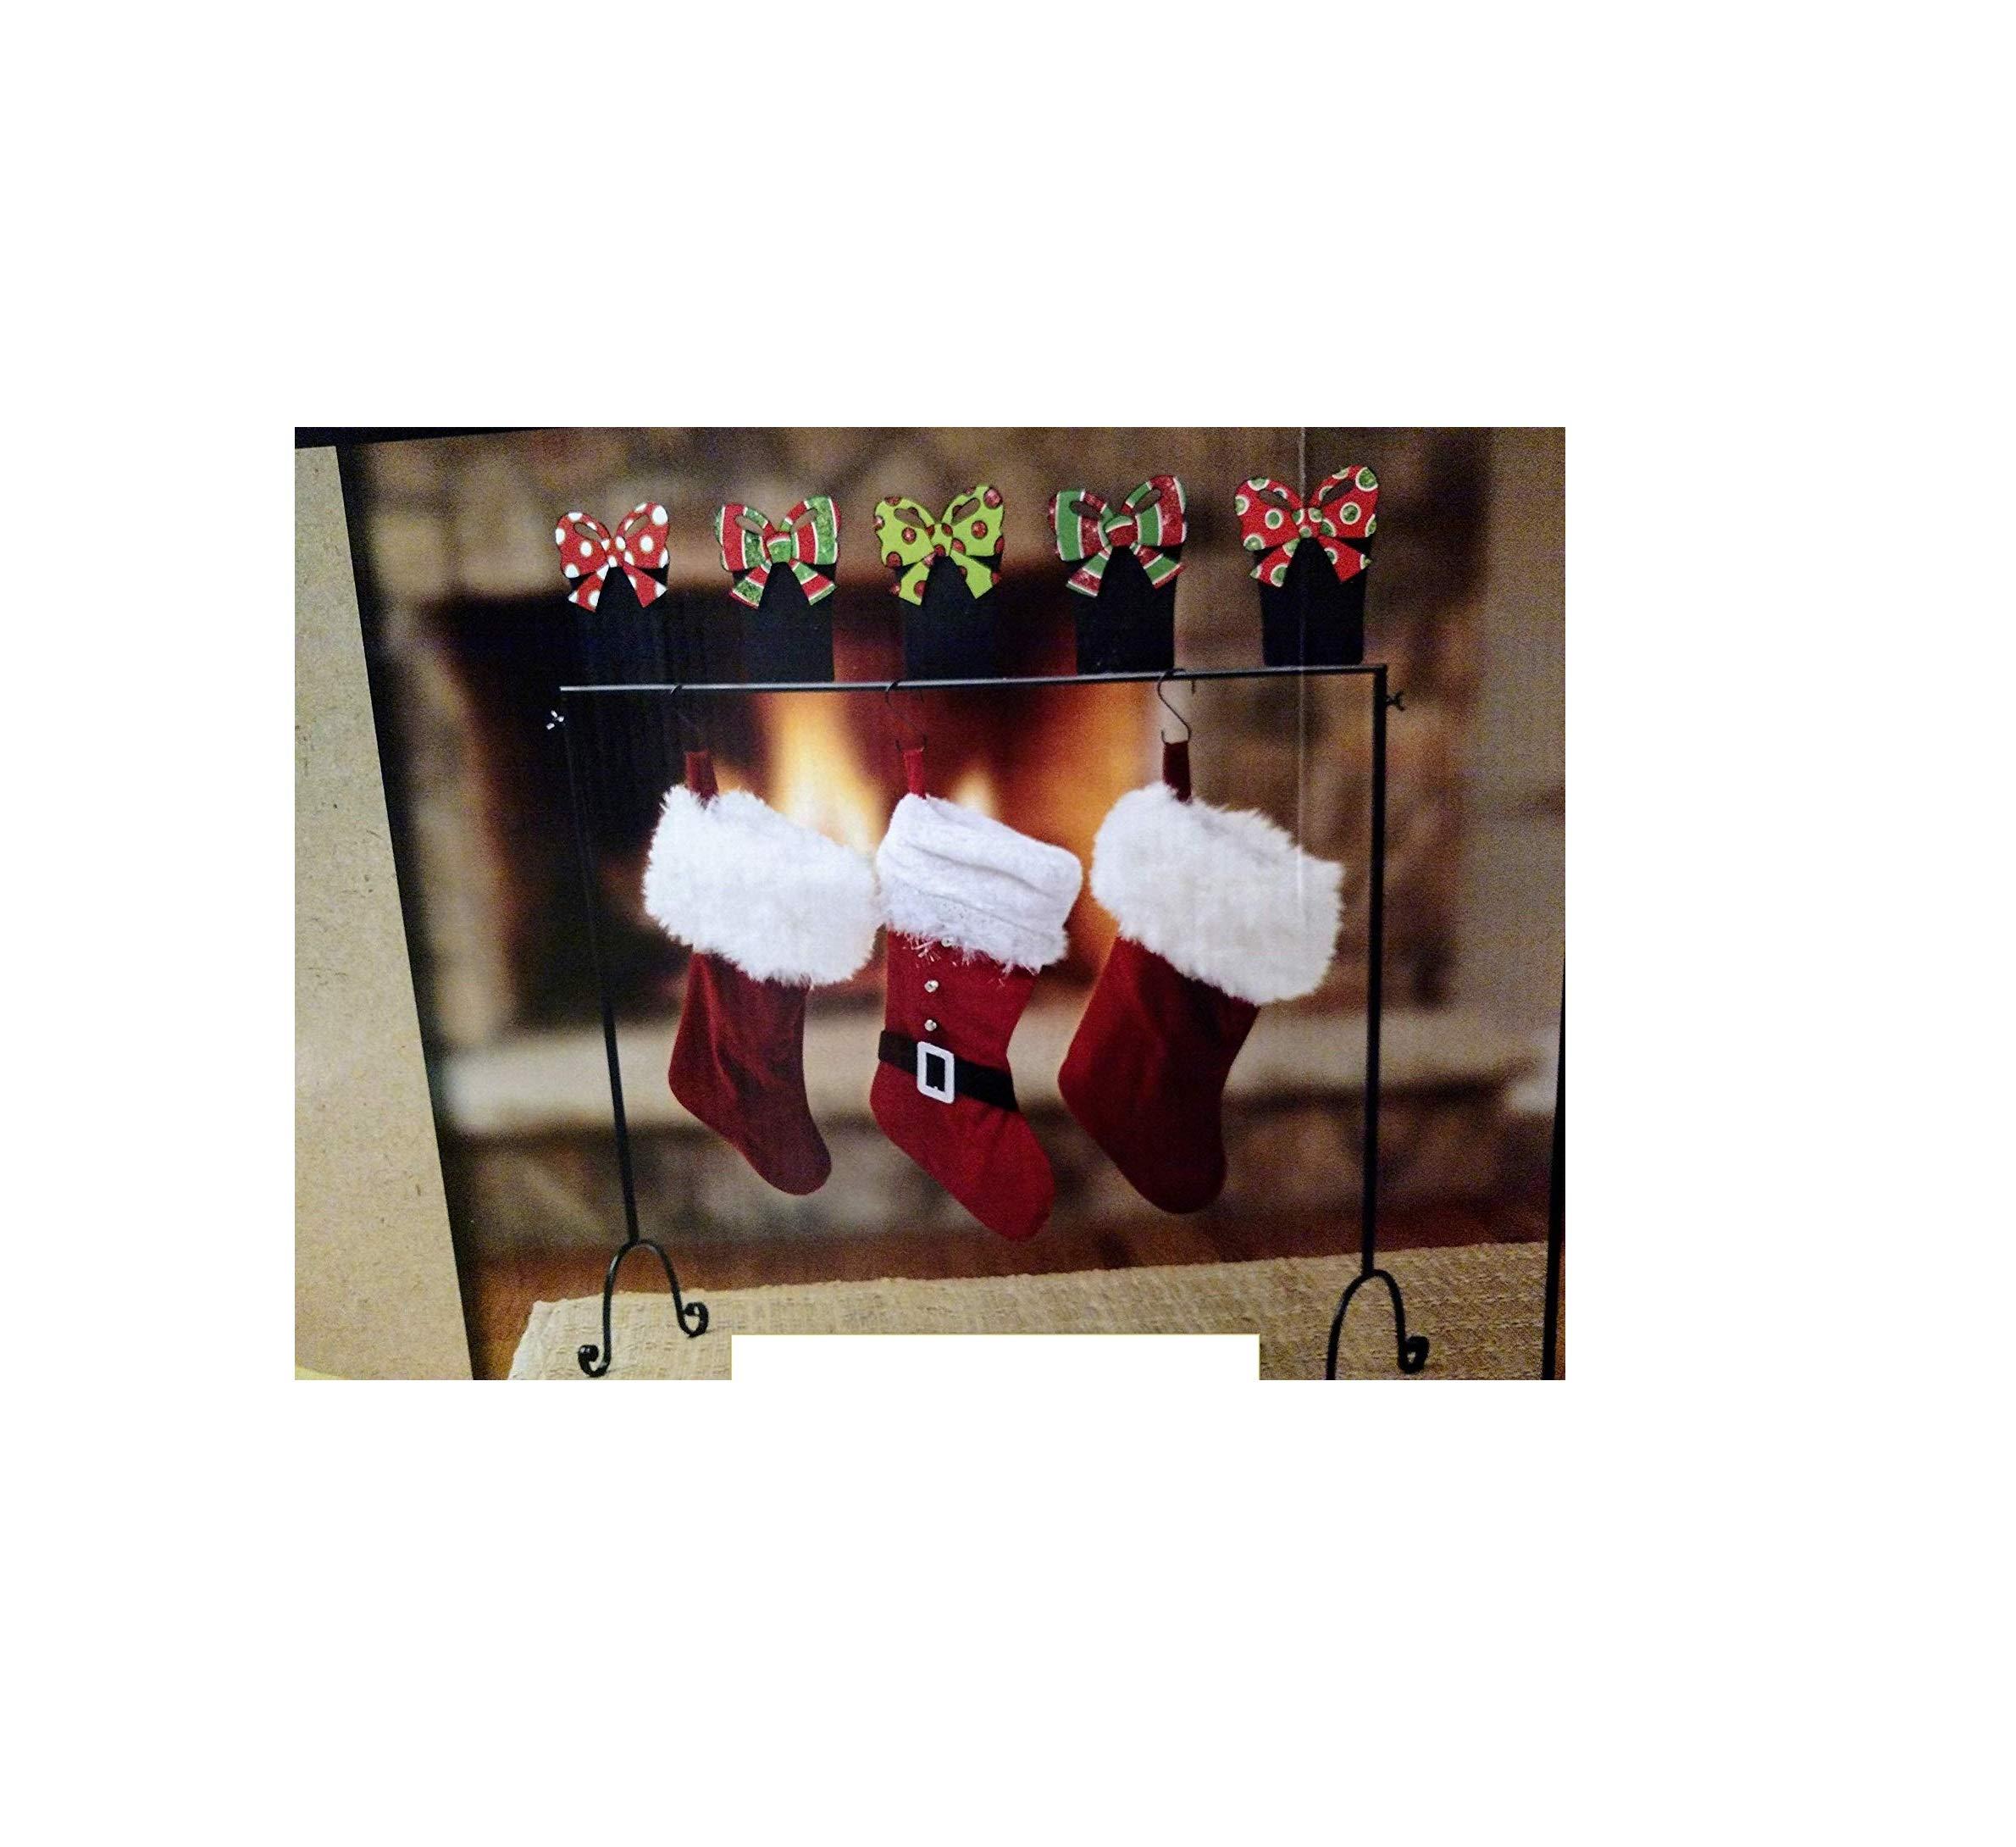 Nantucket Home Metal Freestanding Floor Christmas Stocking Holder Chalkboard Ornaments Design